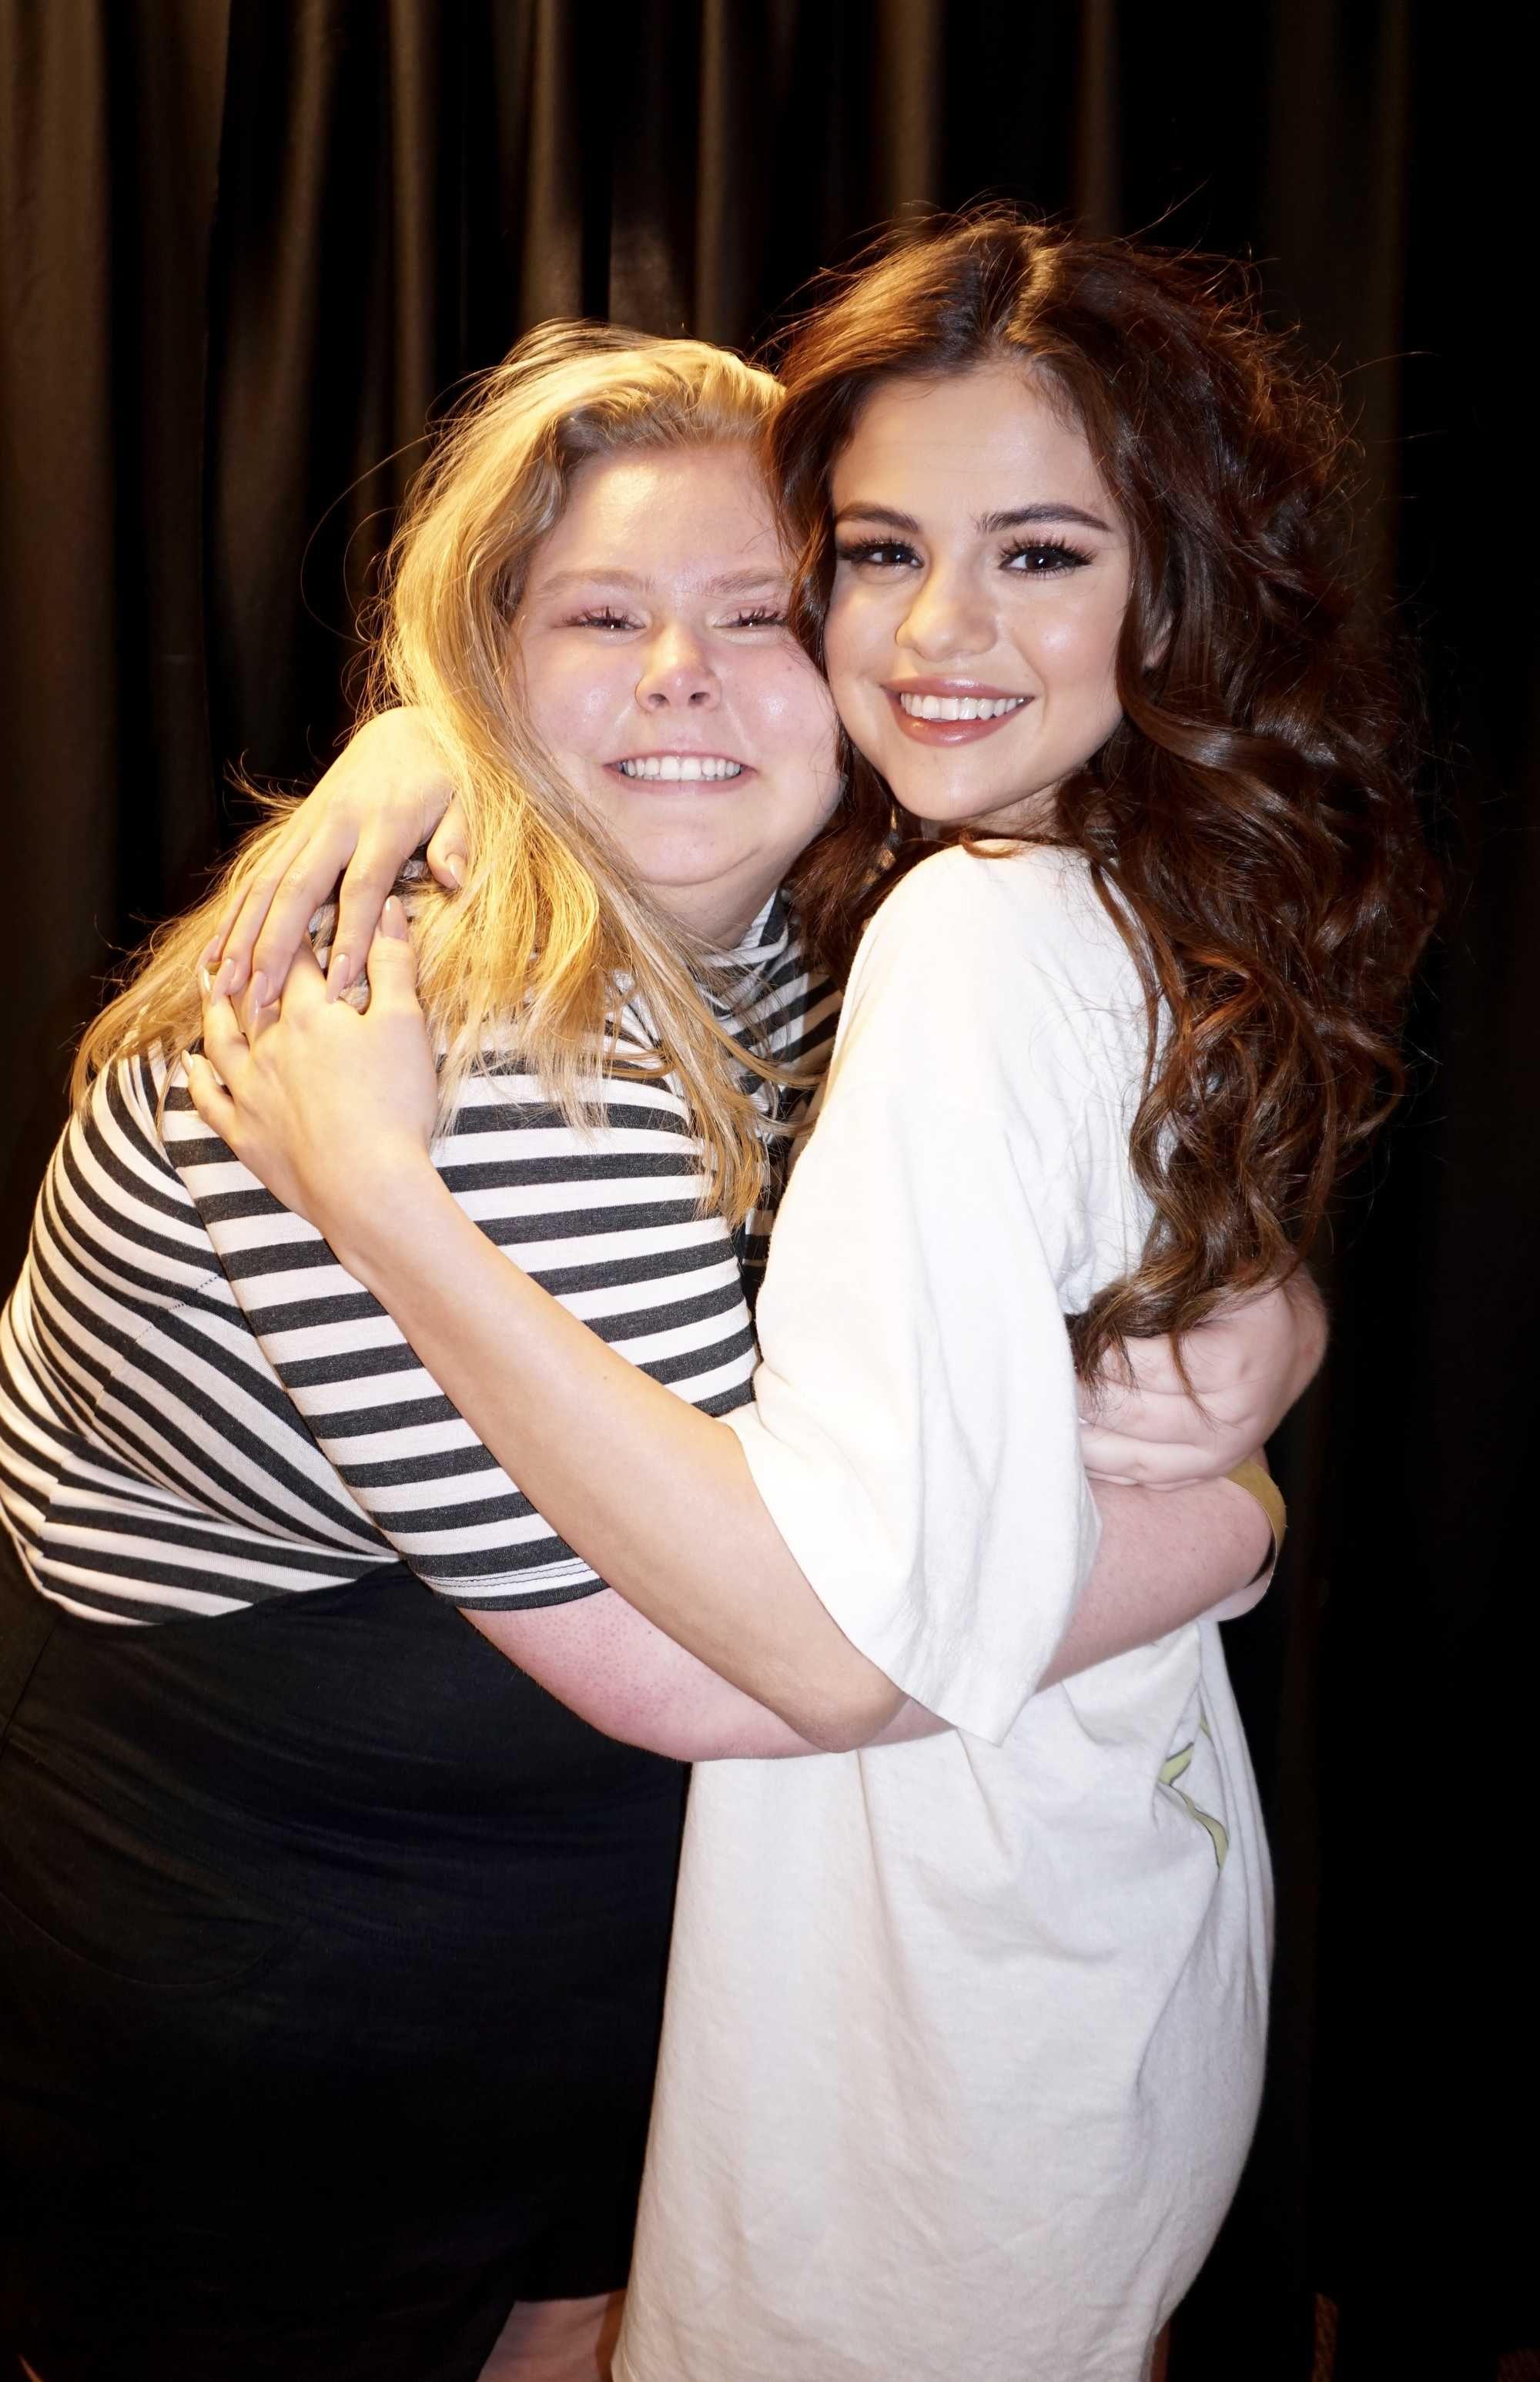 Selena gomez tours concerts revival tour 2016 2017 meet selena gomez tours concerts revival tour 2016 2017 meet greet kristyandbryce Choice Image